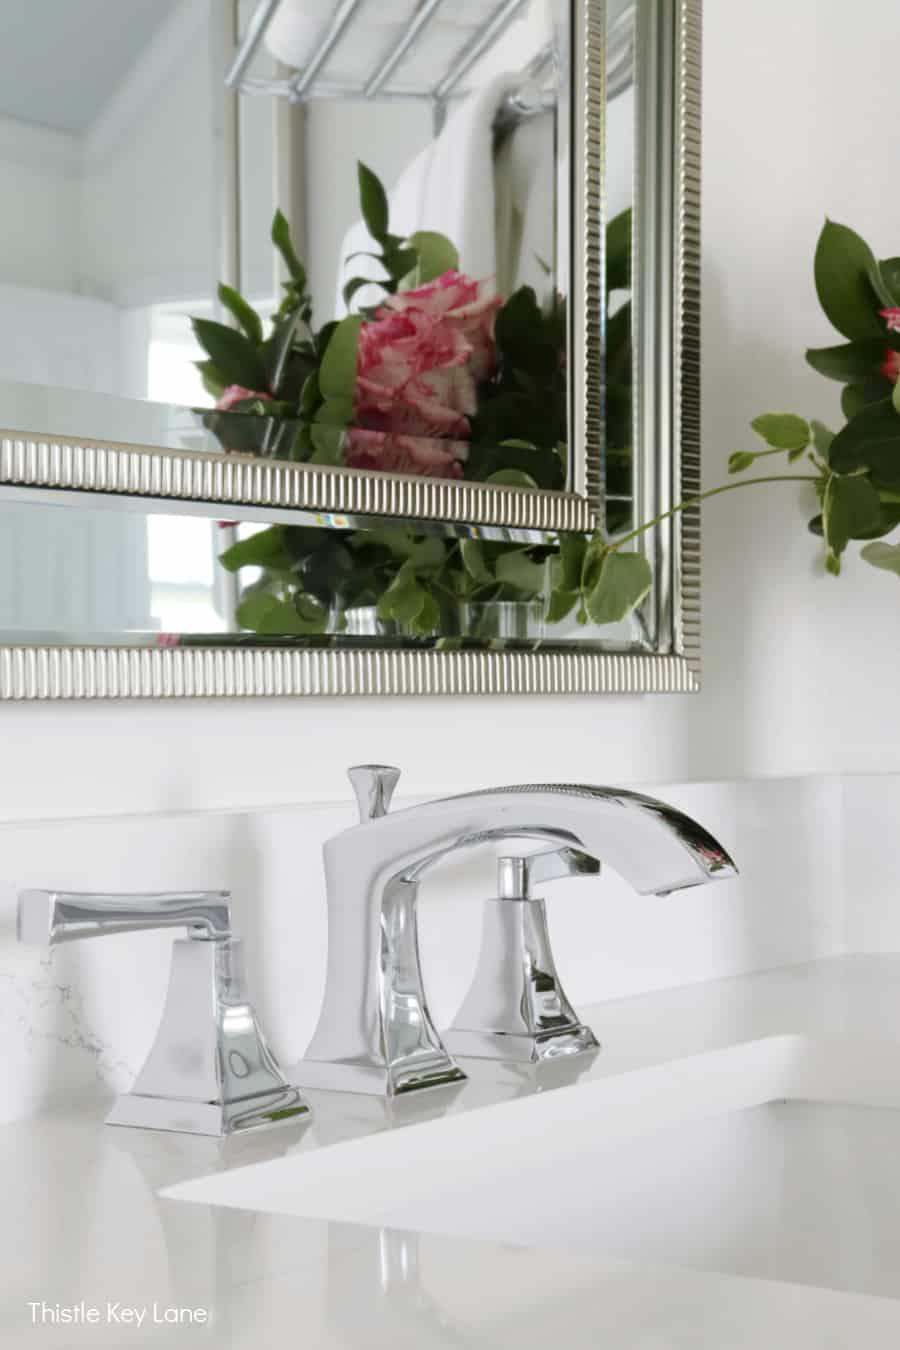 Chrome faucet and white quartz countertop. White And Gray Bathroom Makeover.